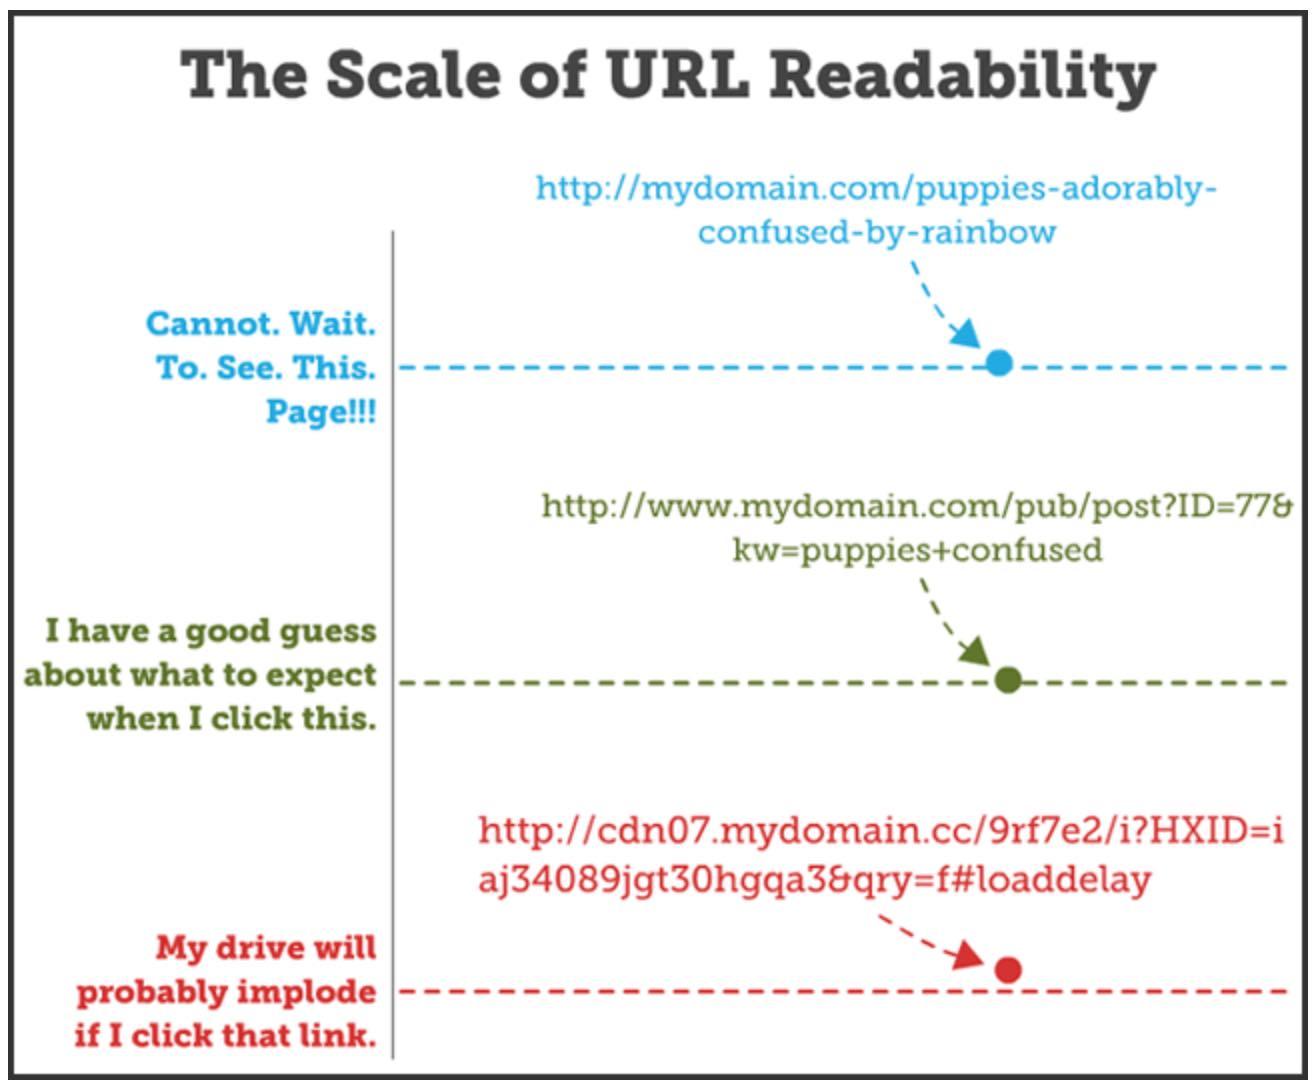 scale ot URL readability - seo sydney experts